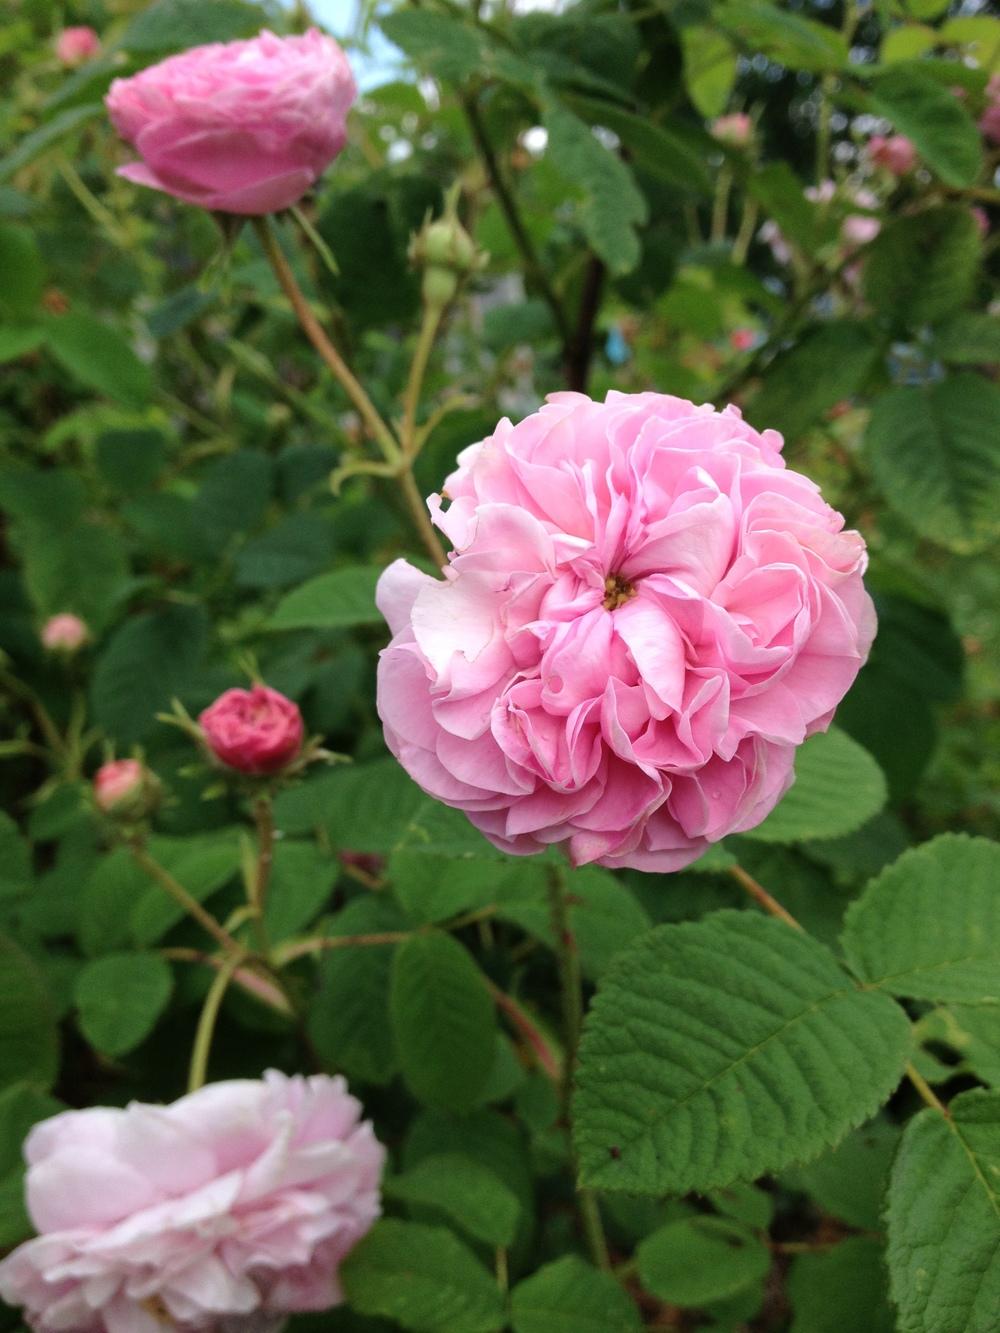 rose in garden.jpg